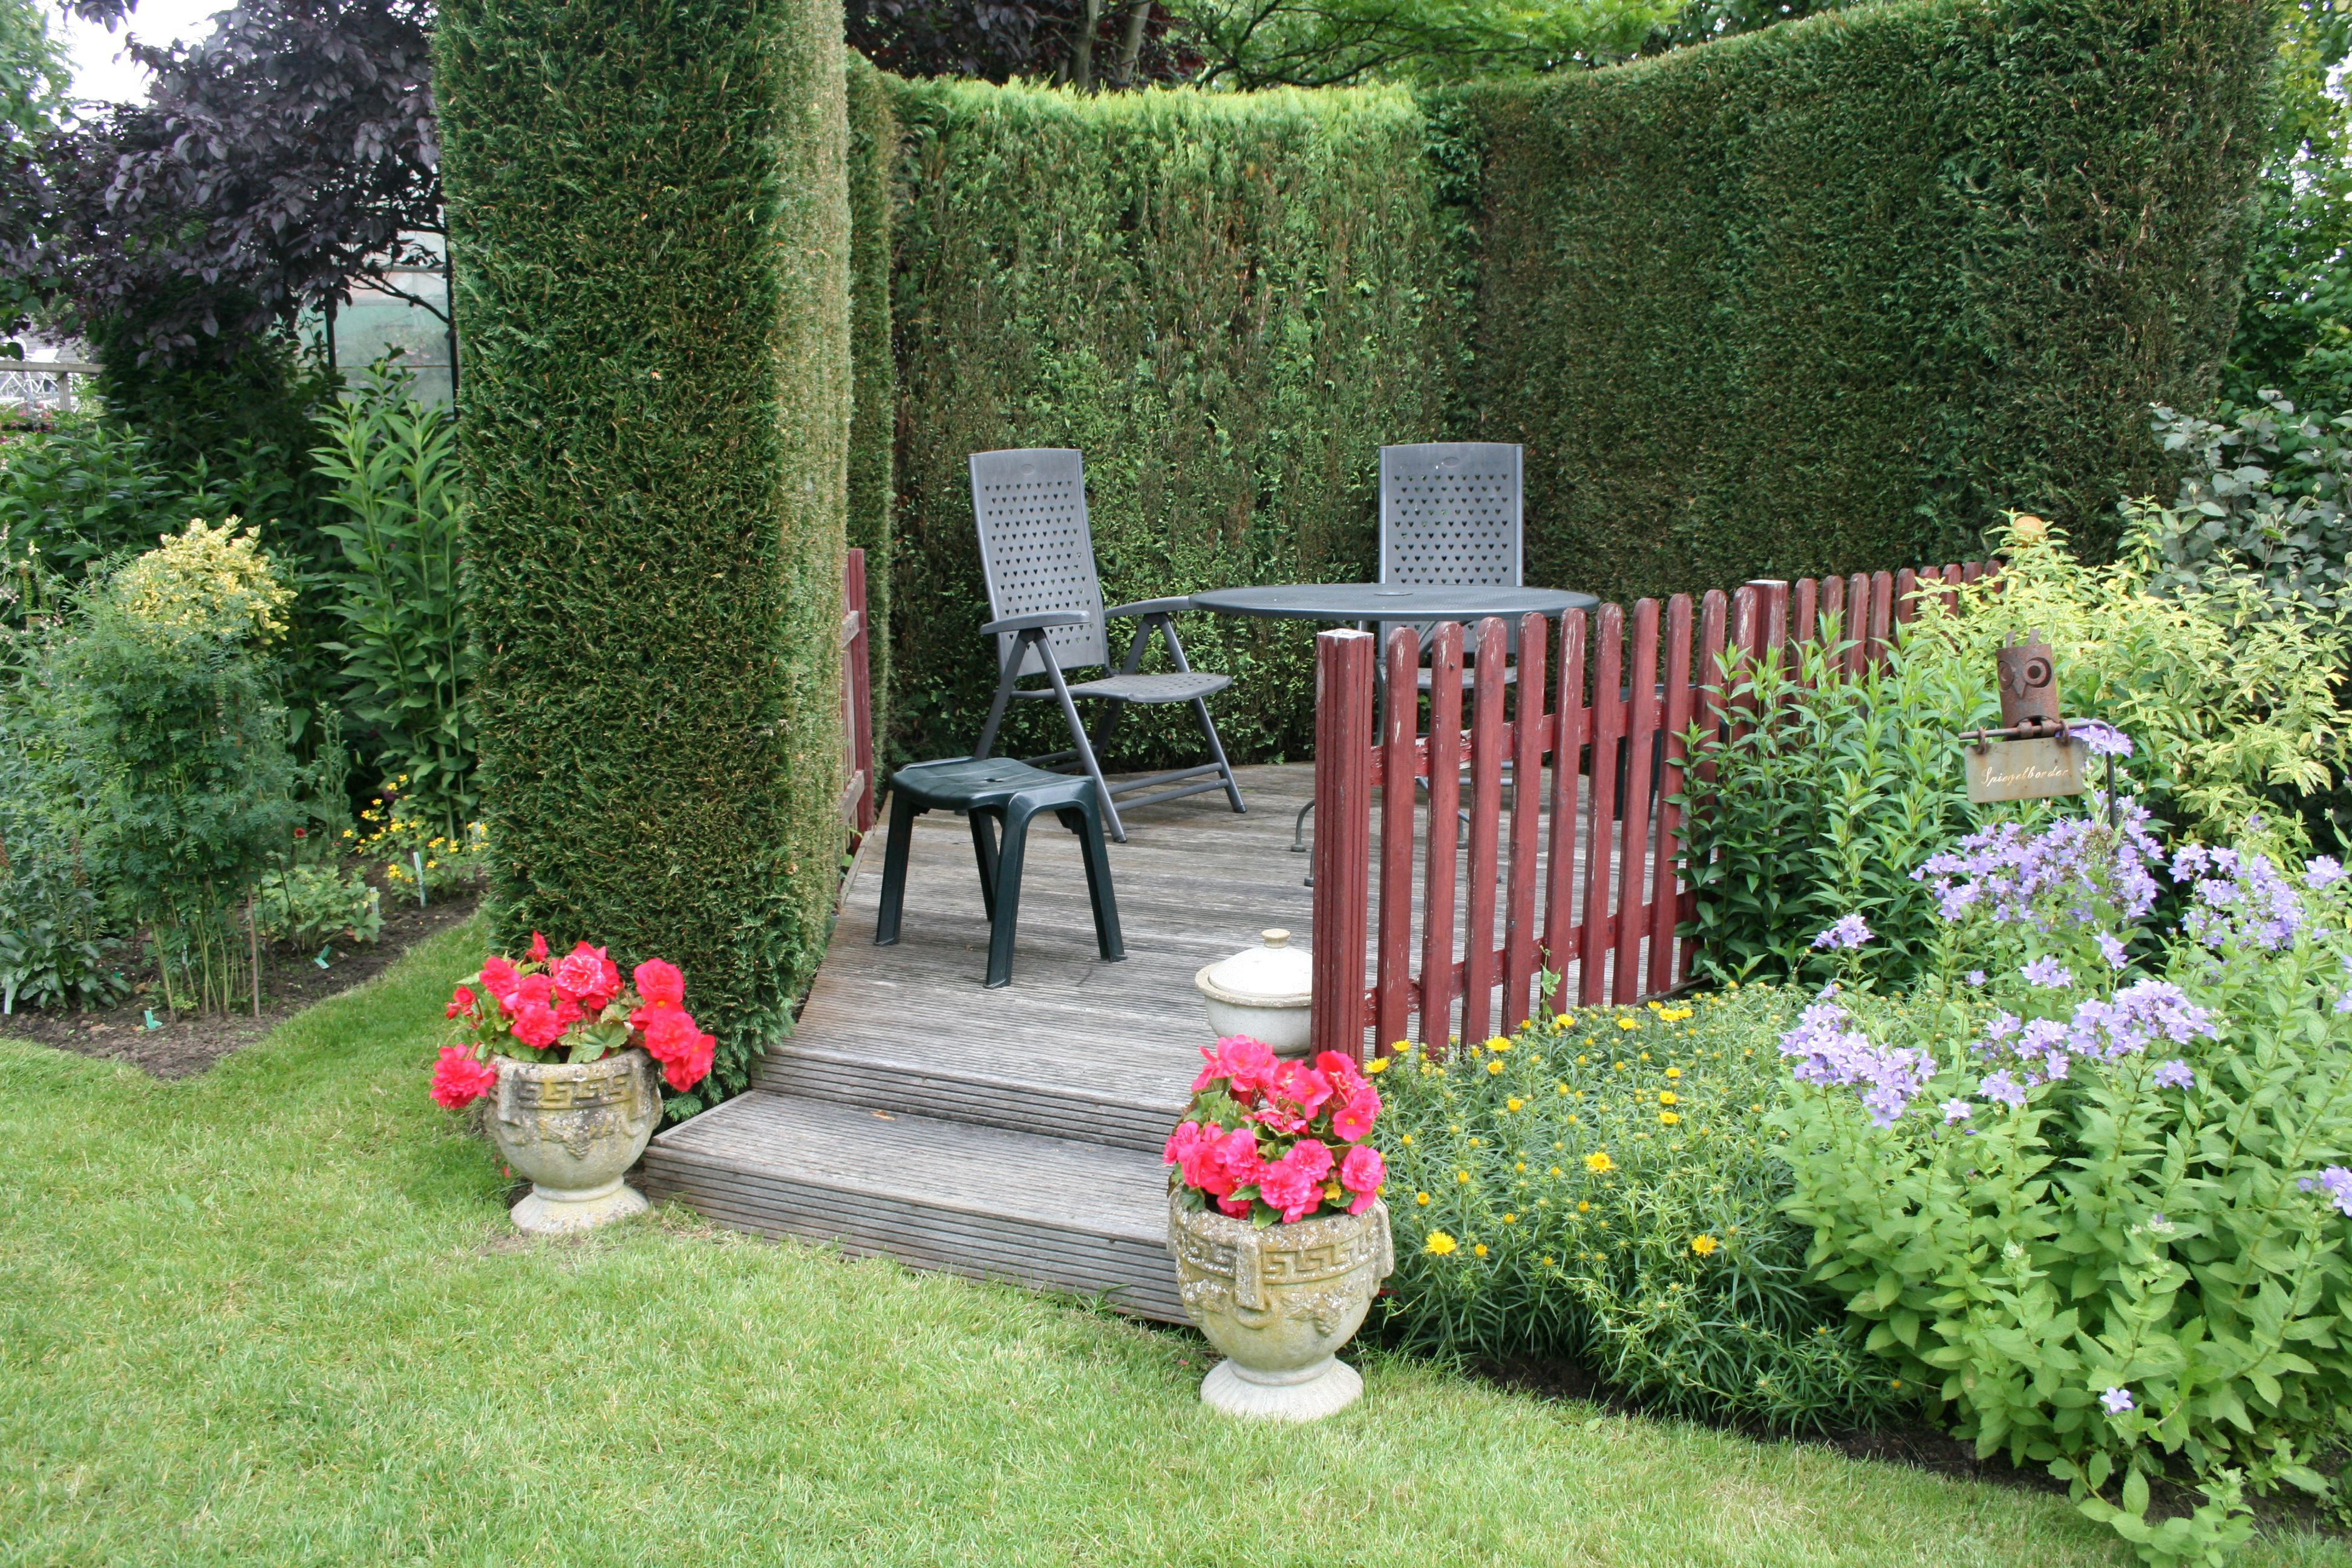 Sitzplätze Im Garten gartenreise sitzplätze im garten hochsitz betonamphoren